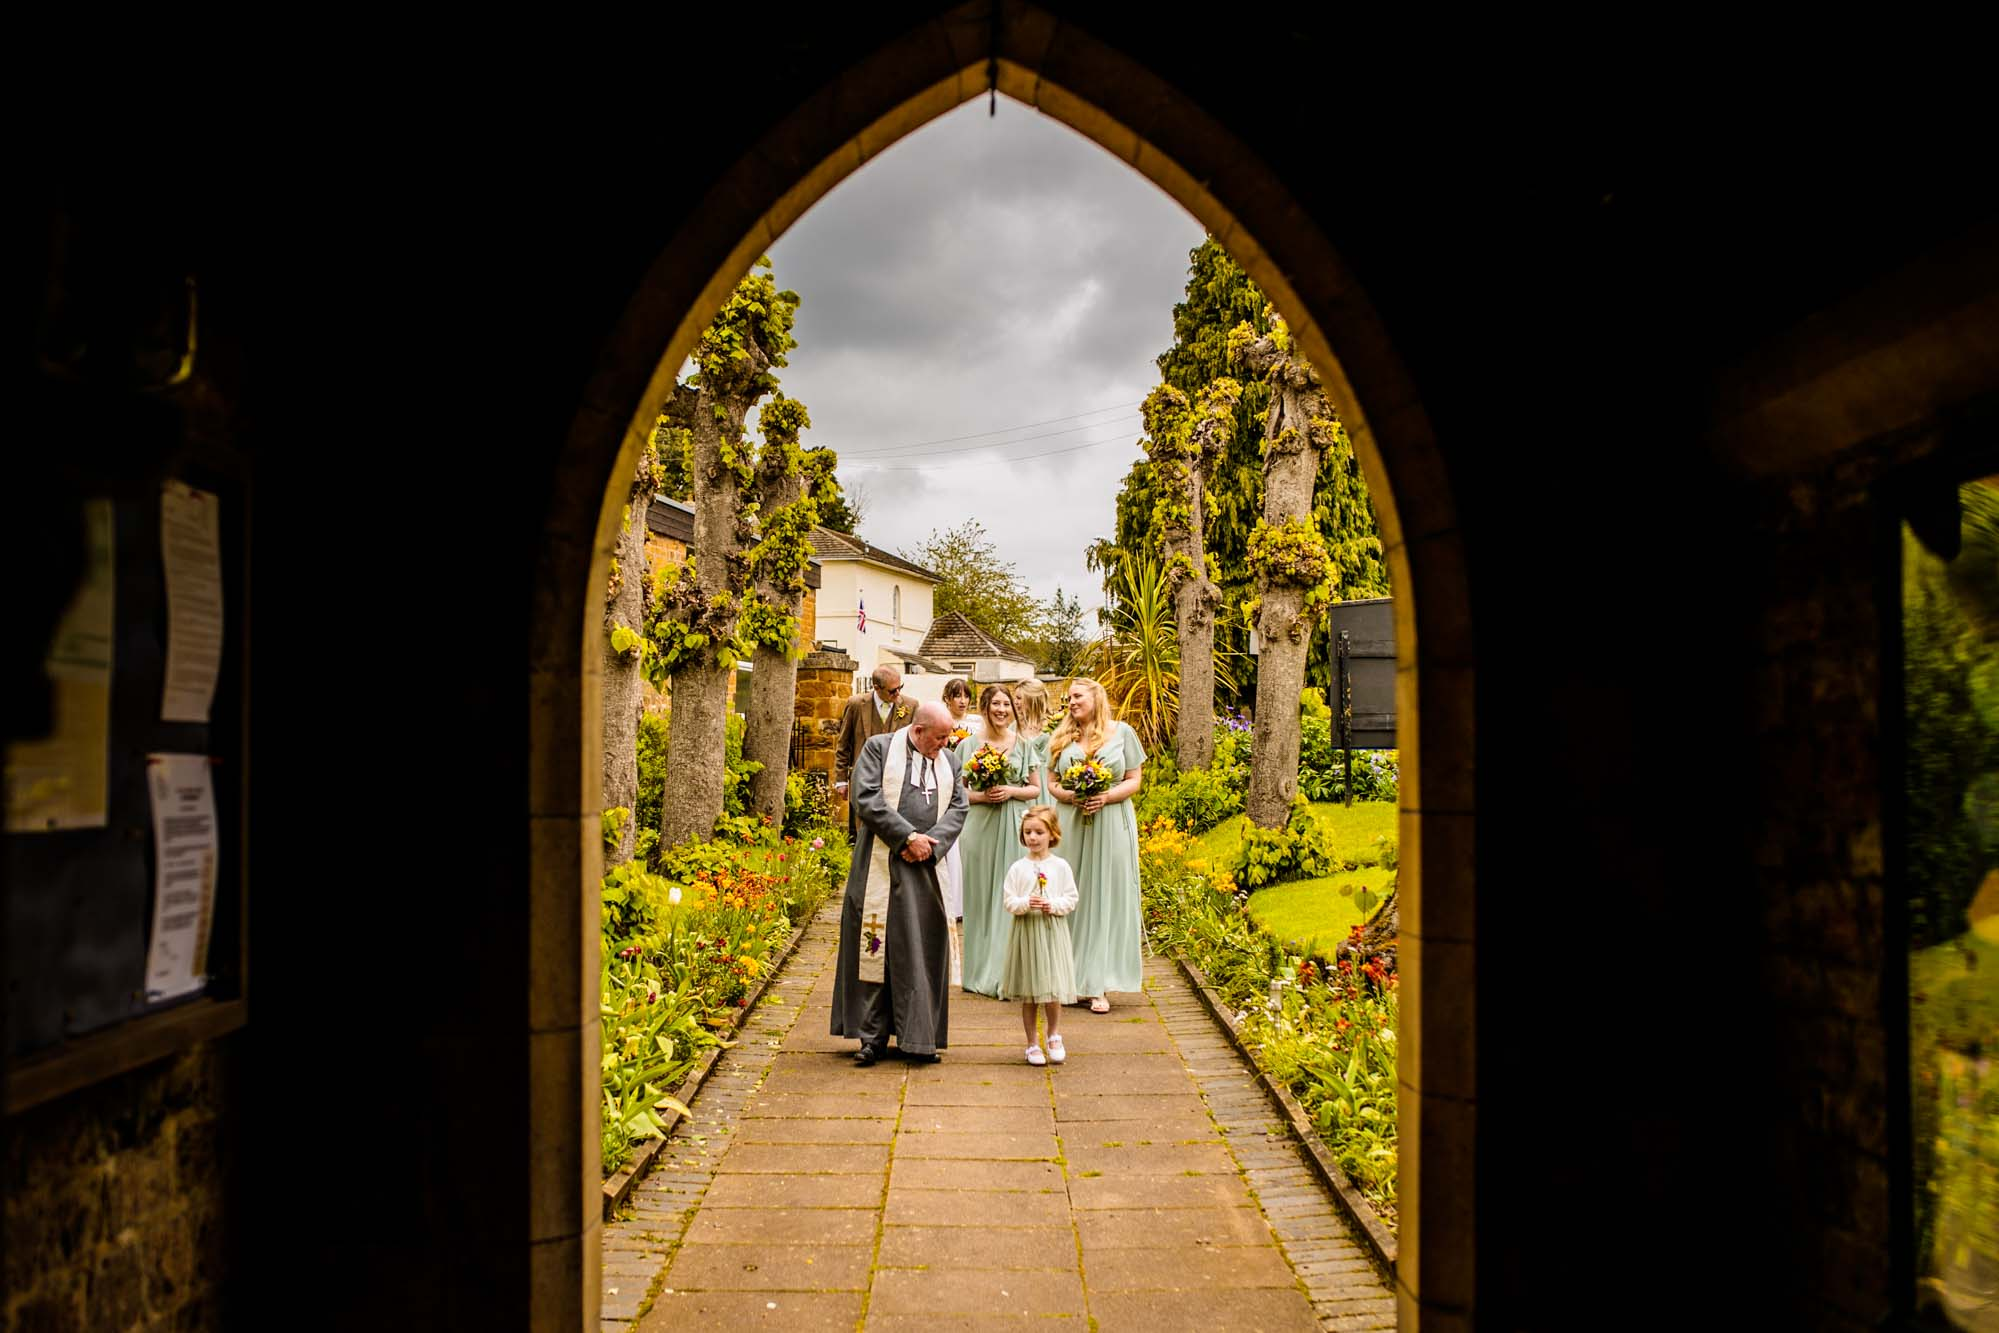 Vicar talking to flower girl entering church